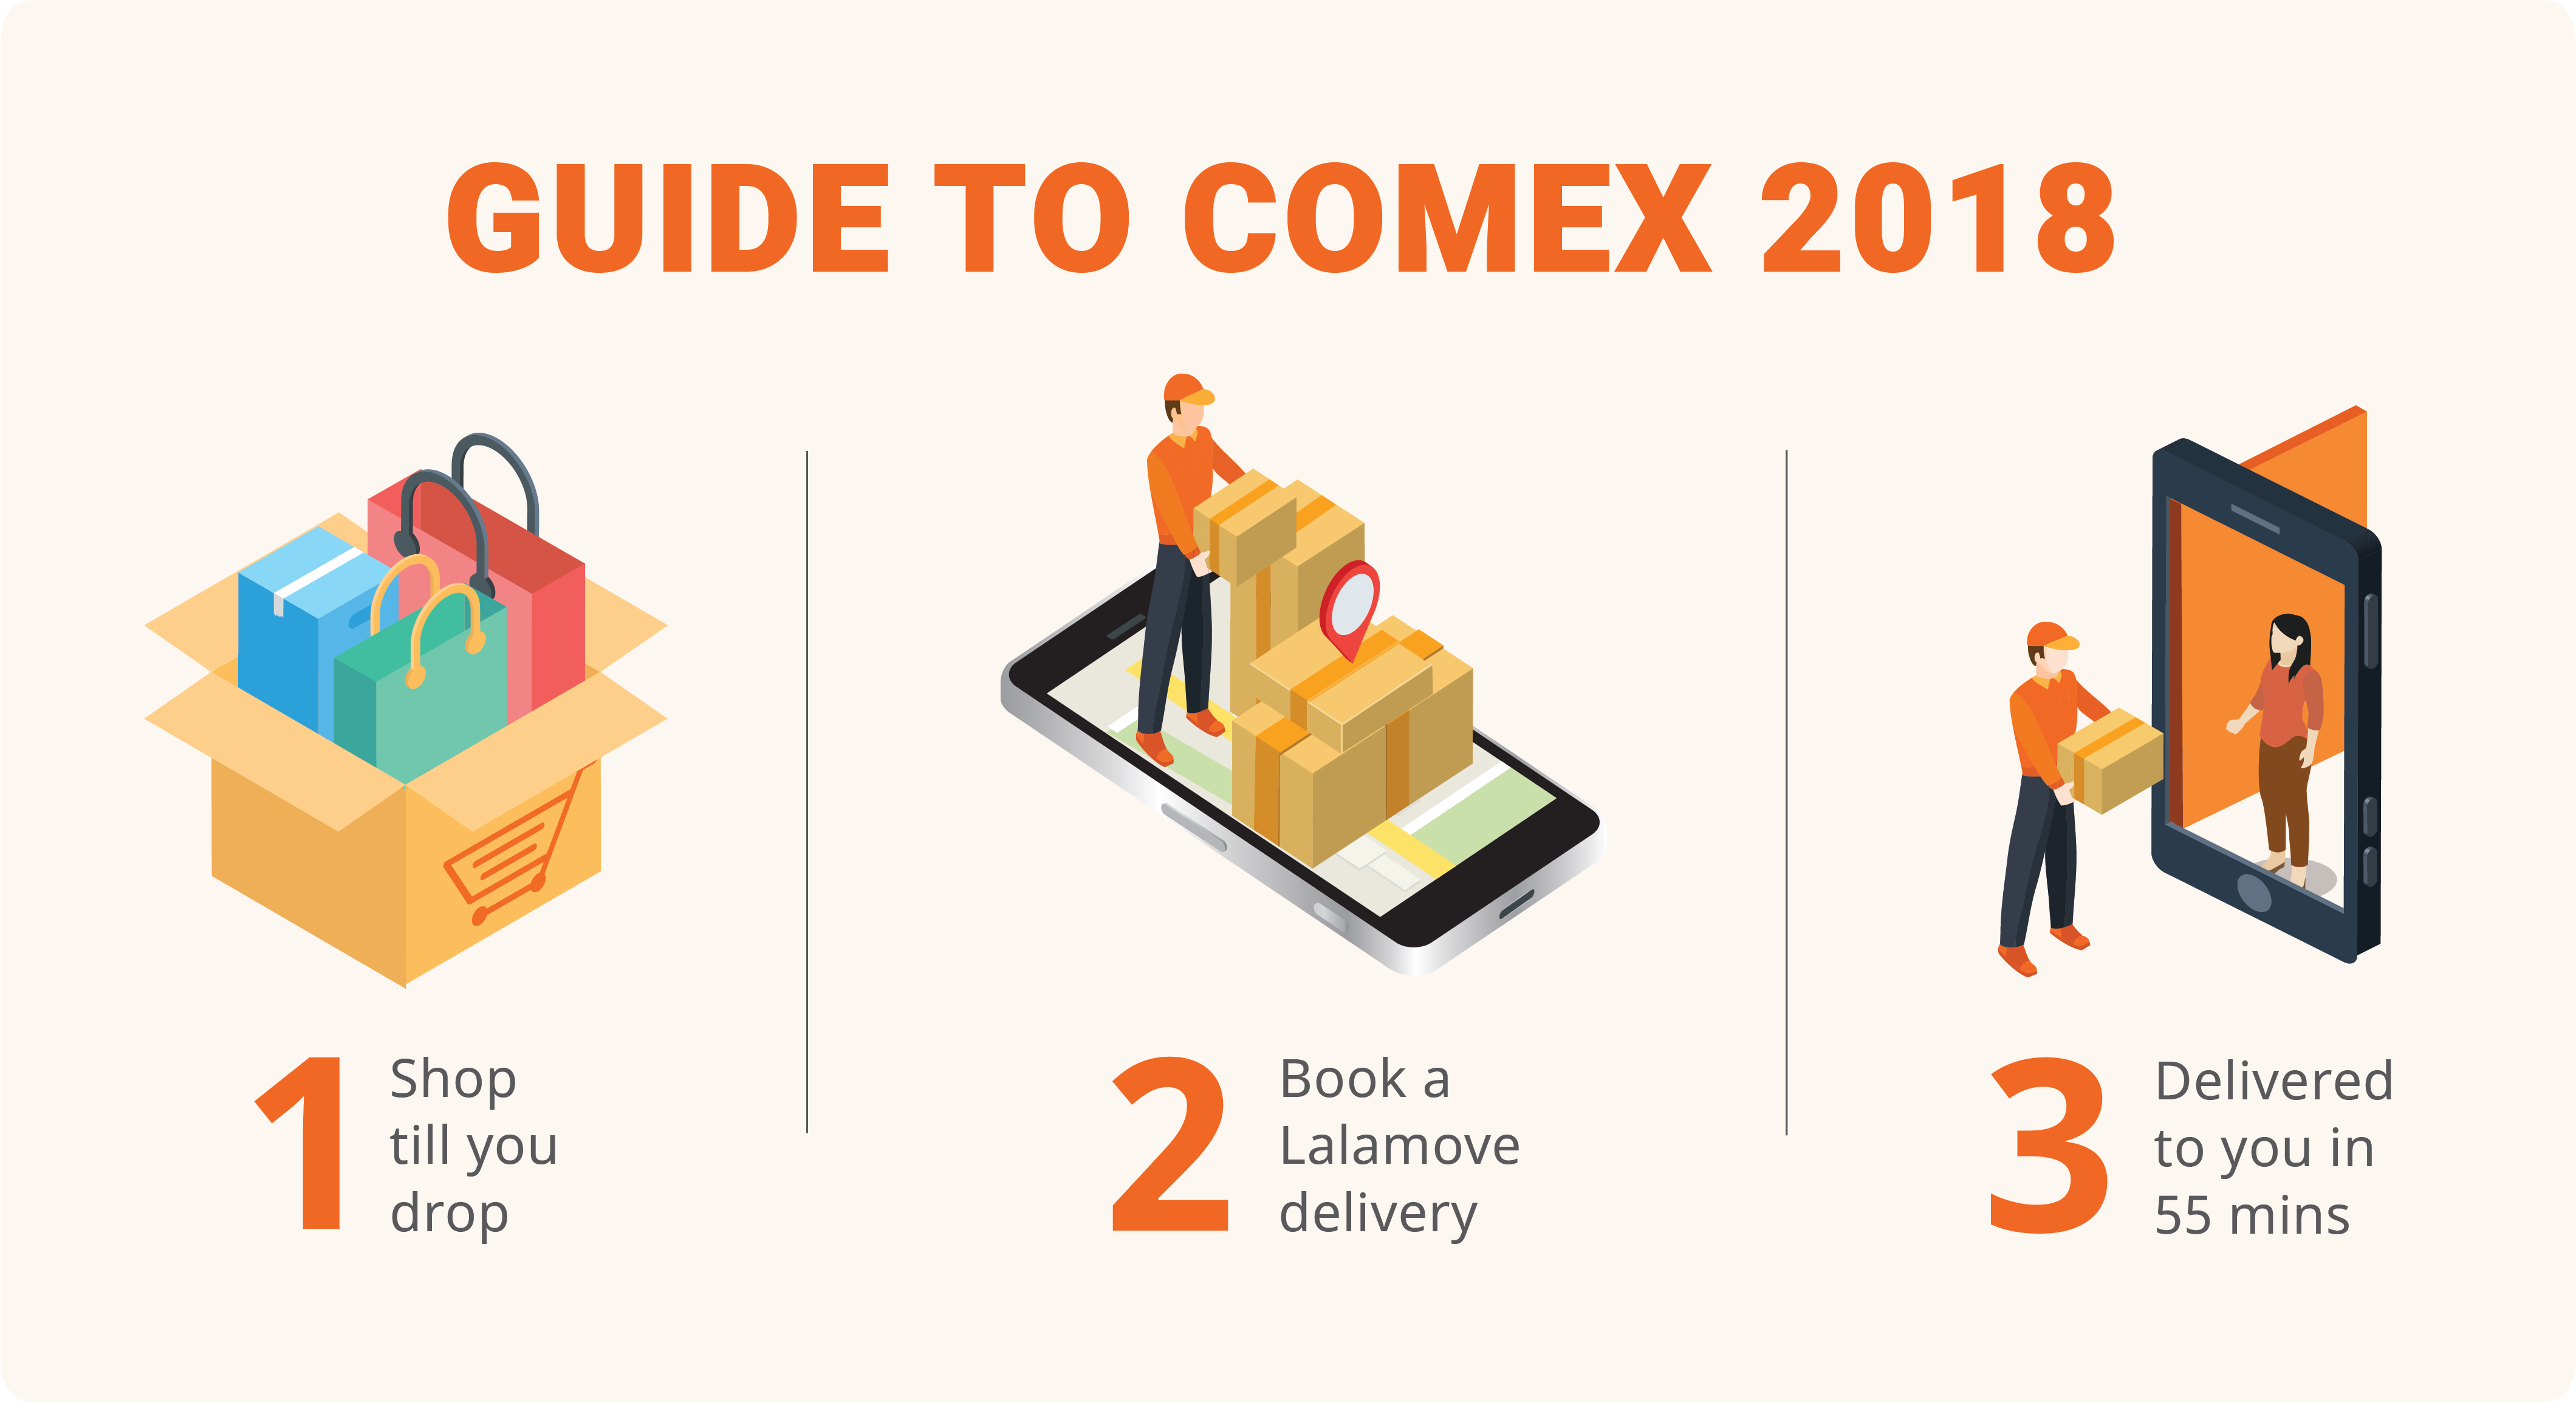 guide to comex - lalamove